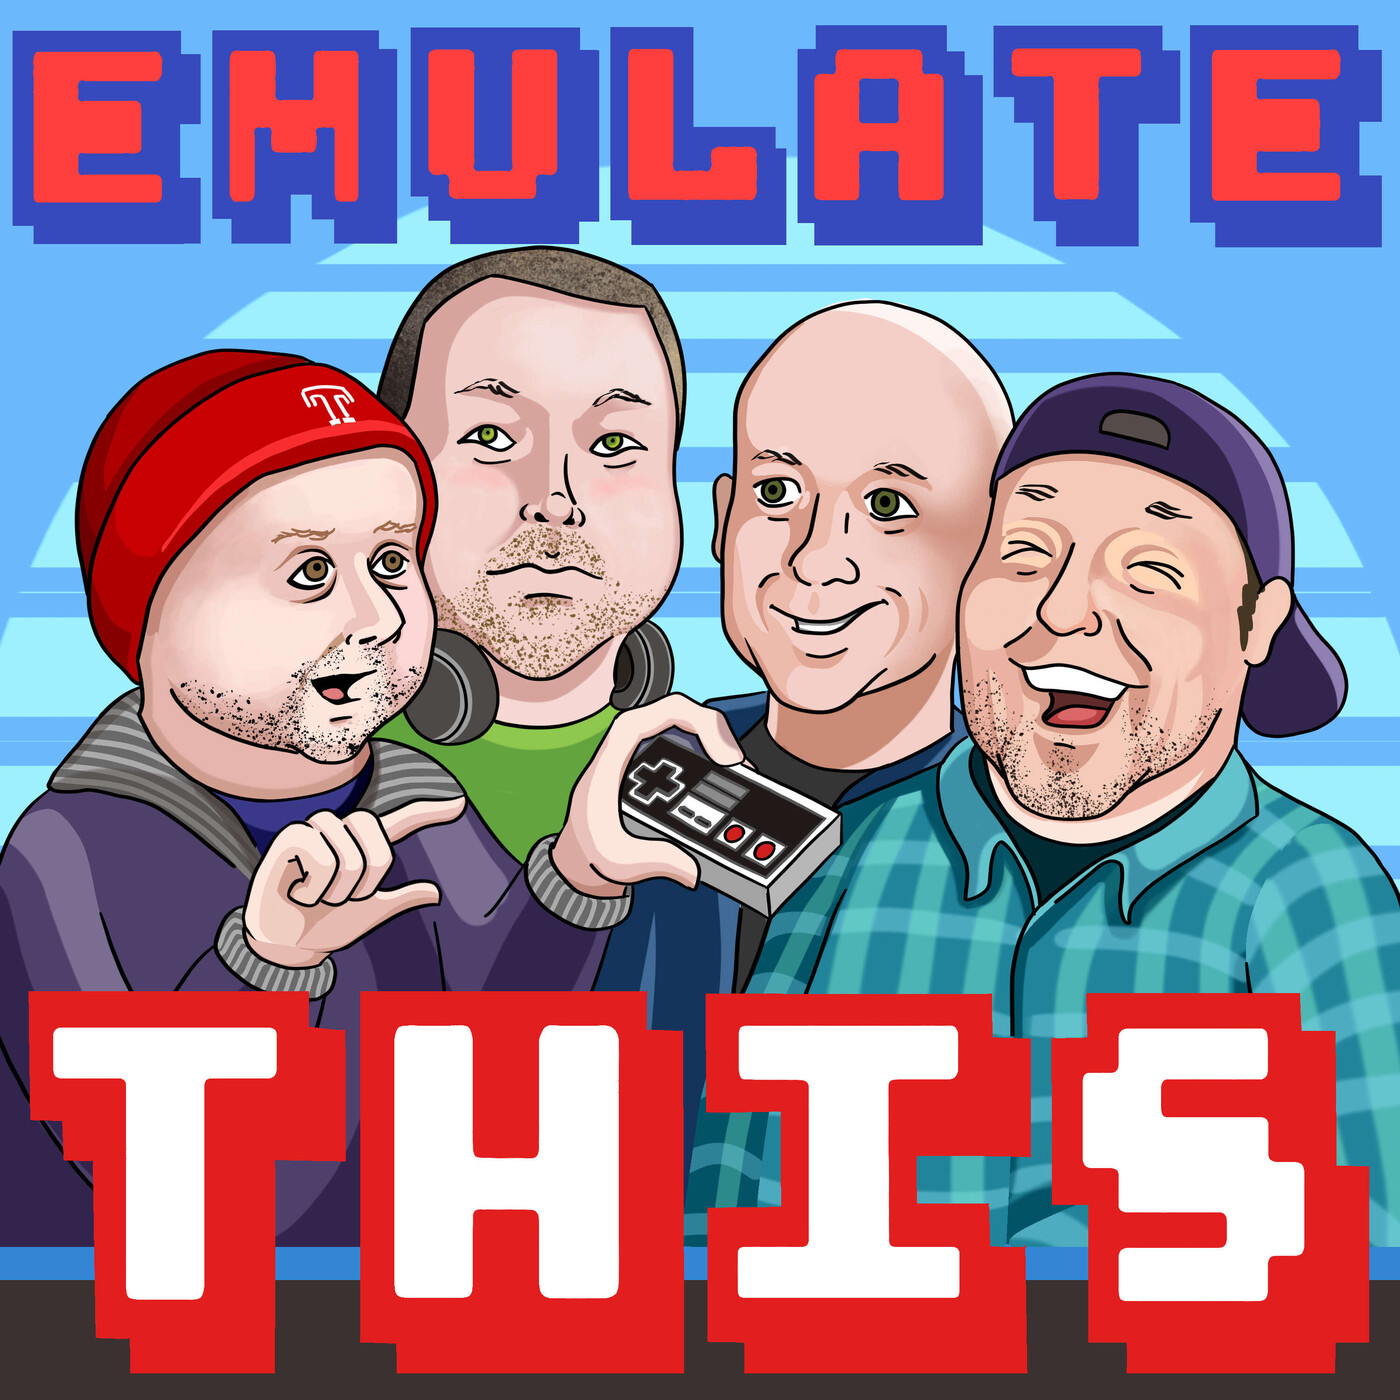 020: ToeJam & Earl/Our Top 5 NES Games/FMK